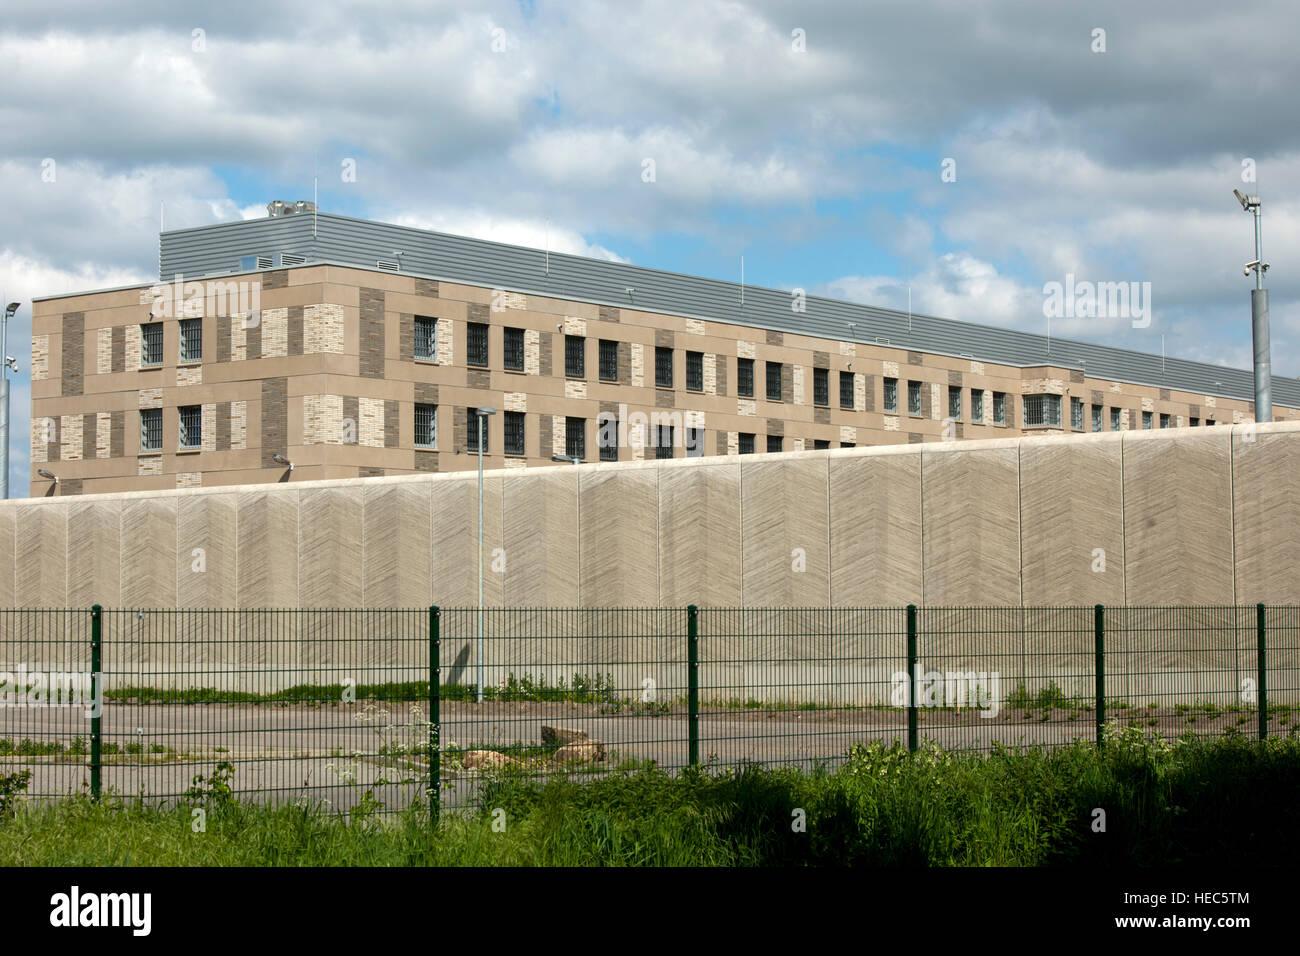 Justizvollzugsanstalt Saarbrücken